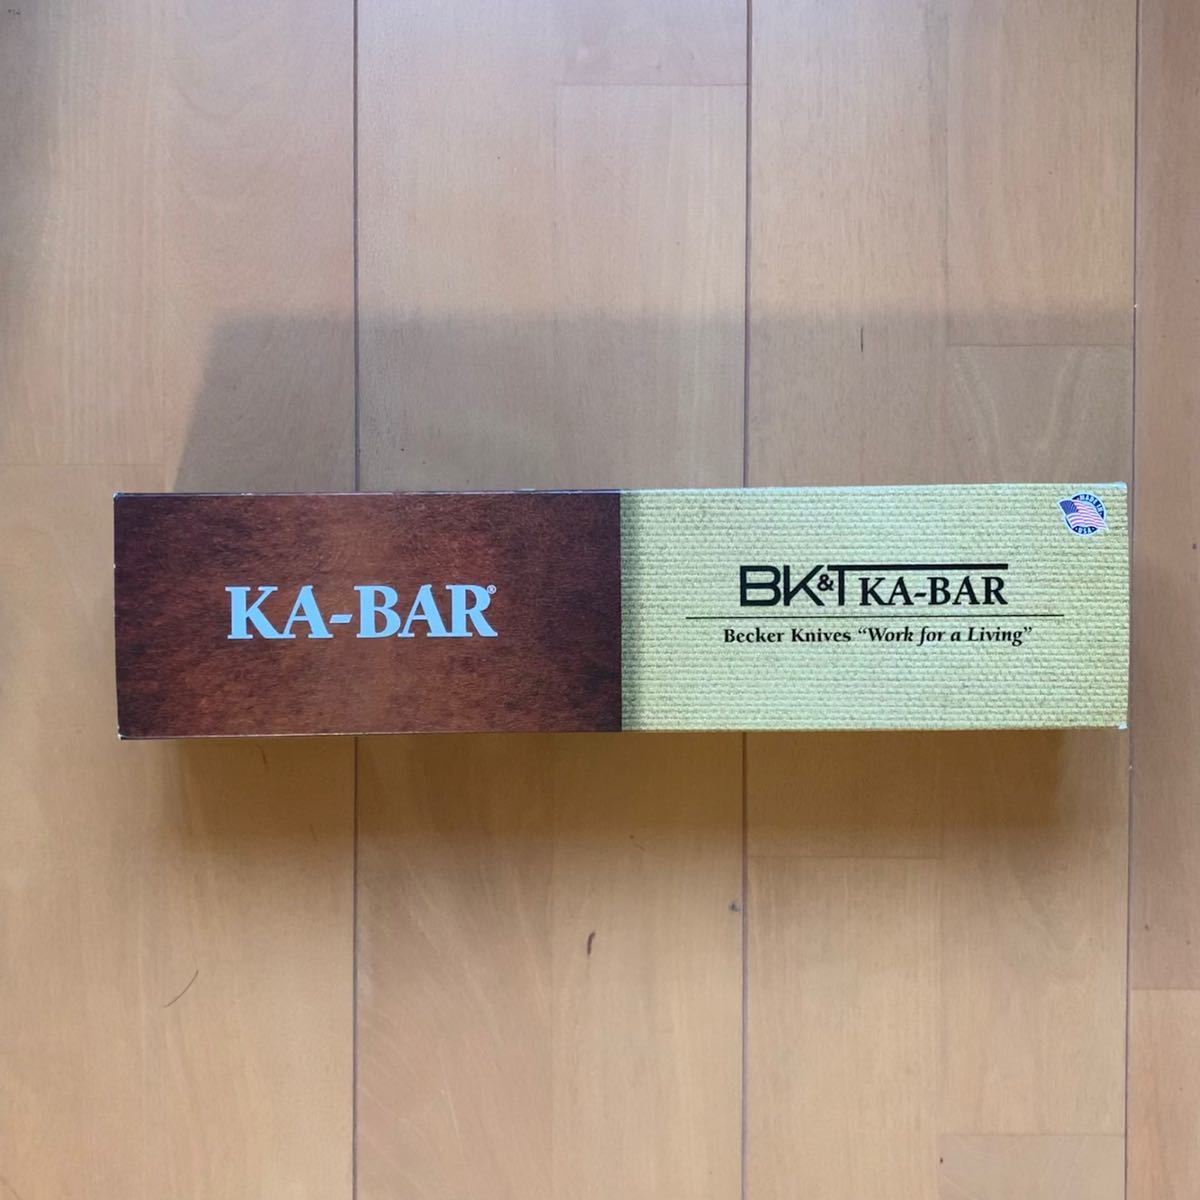 ka-bar ケーバーナイフ ベッカーBK2 ハンティングナイフ サバイバルナイフ